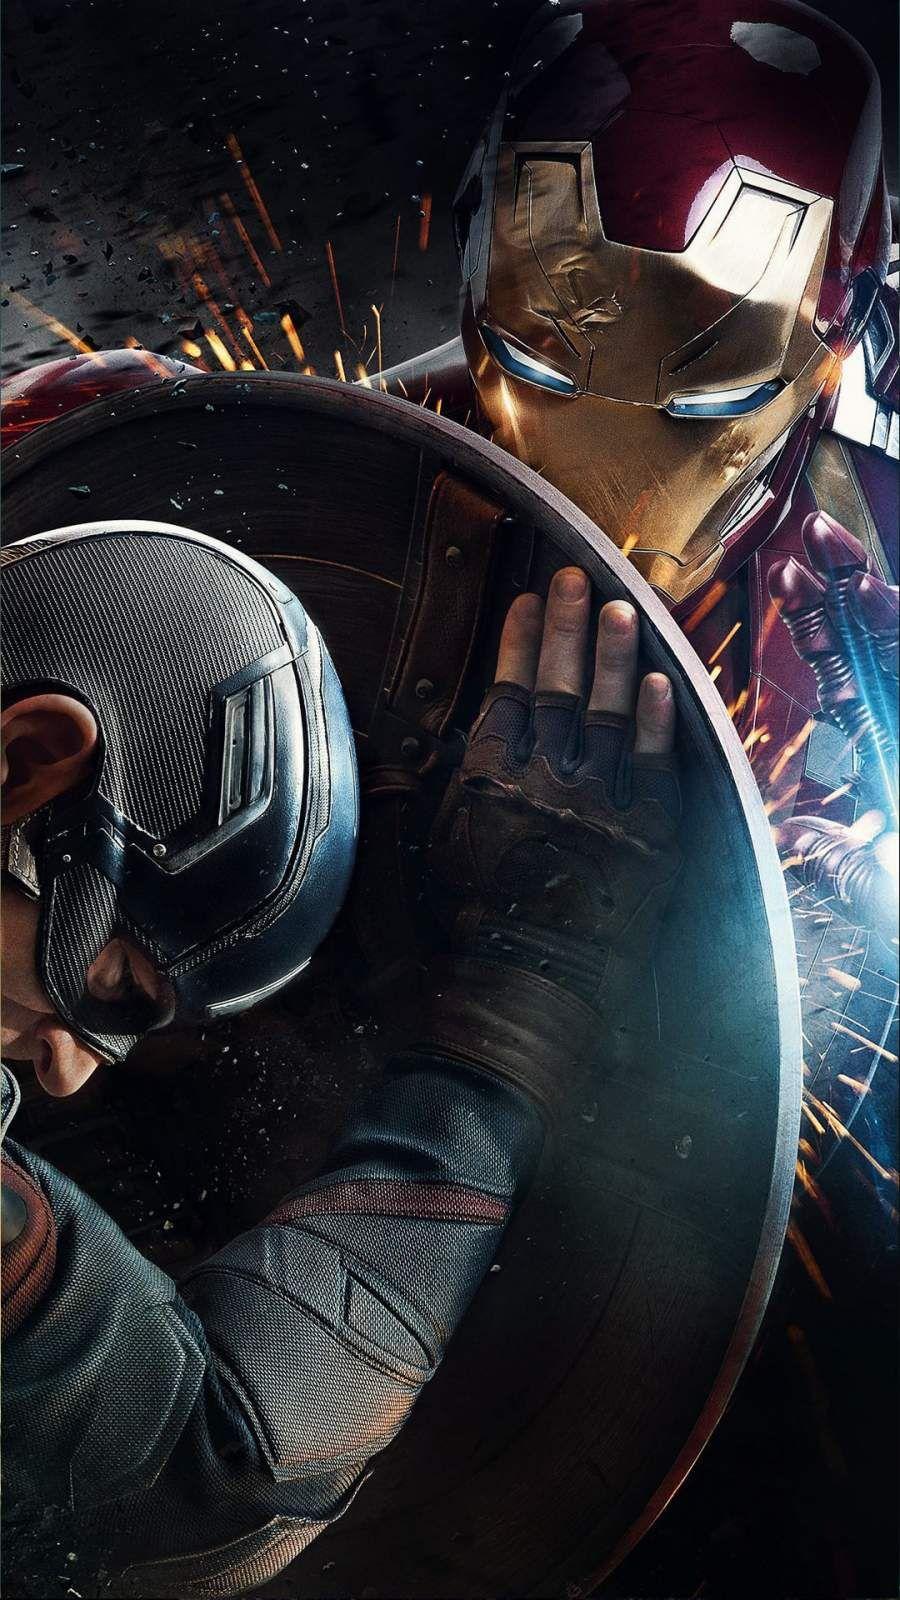 Iron Man Vs Captain America Civil War Iphone Wallpaper Iron Man Vs Captain America Captain America Wallpaper Marvel Wallpaper